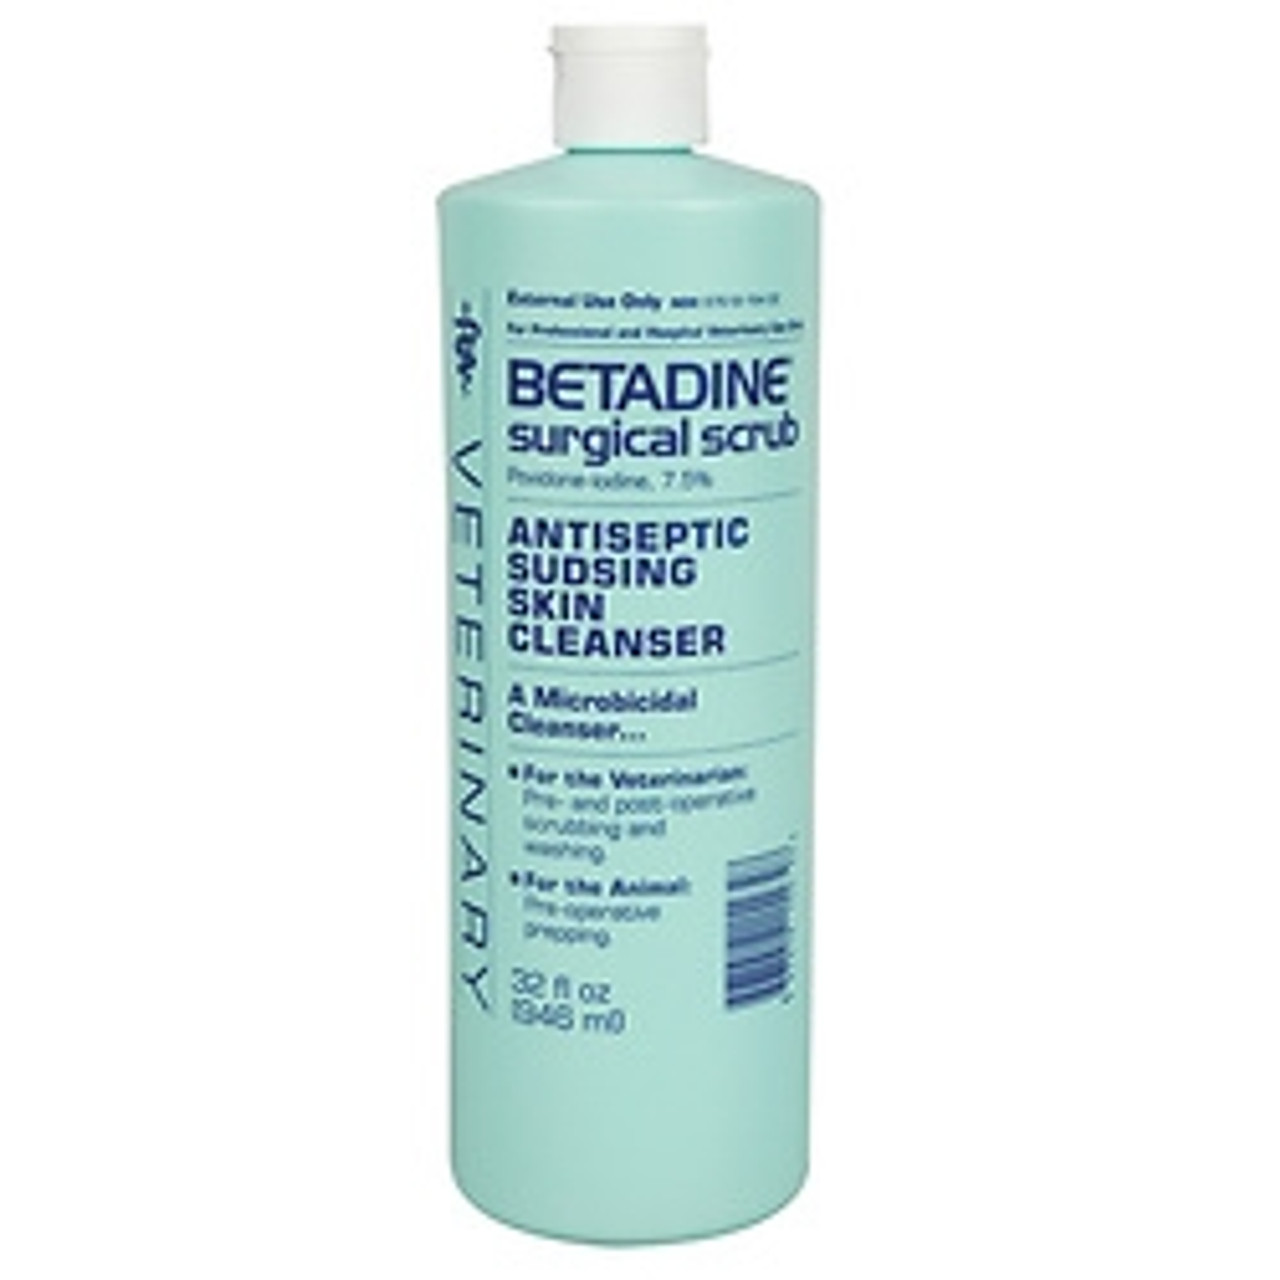 Betadine Surgical Scrub